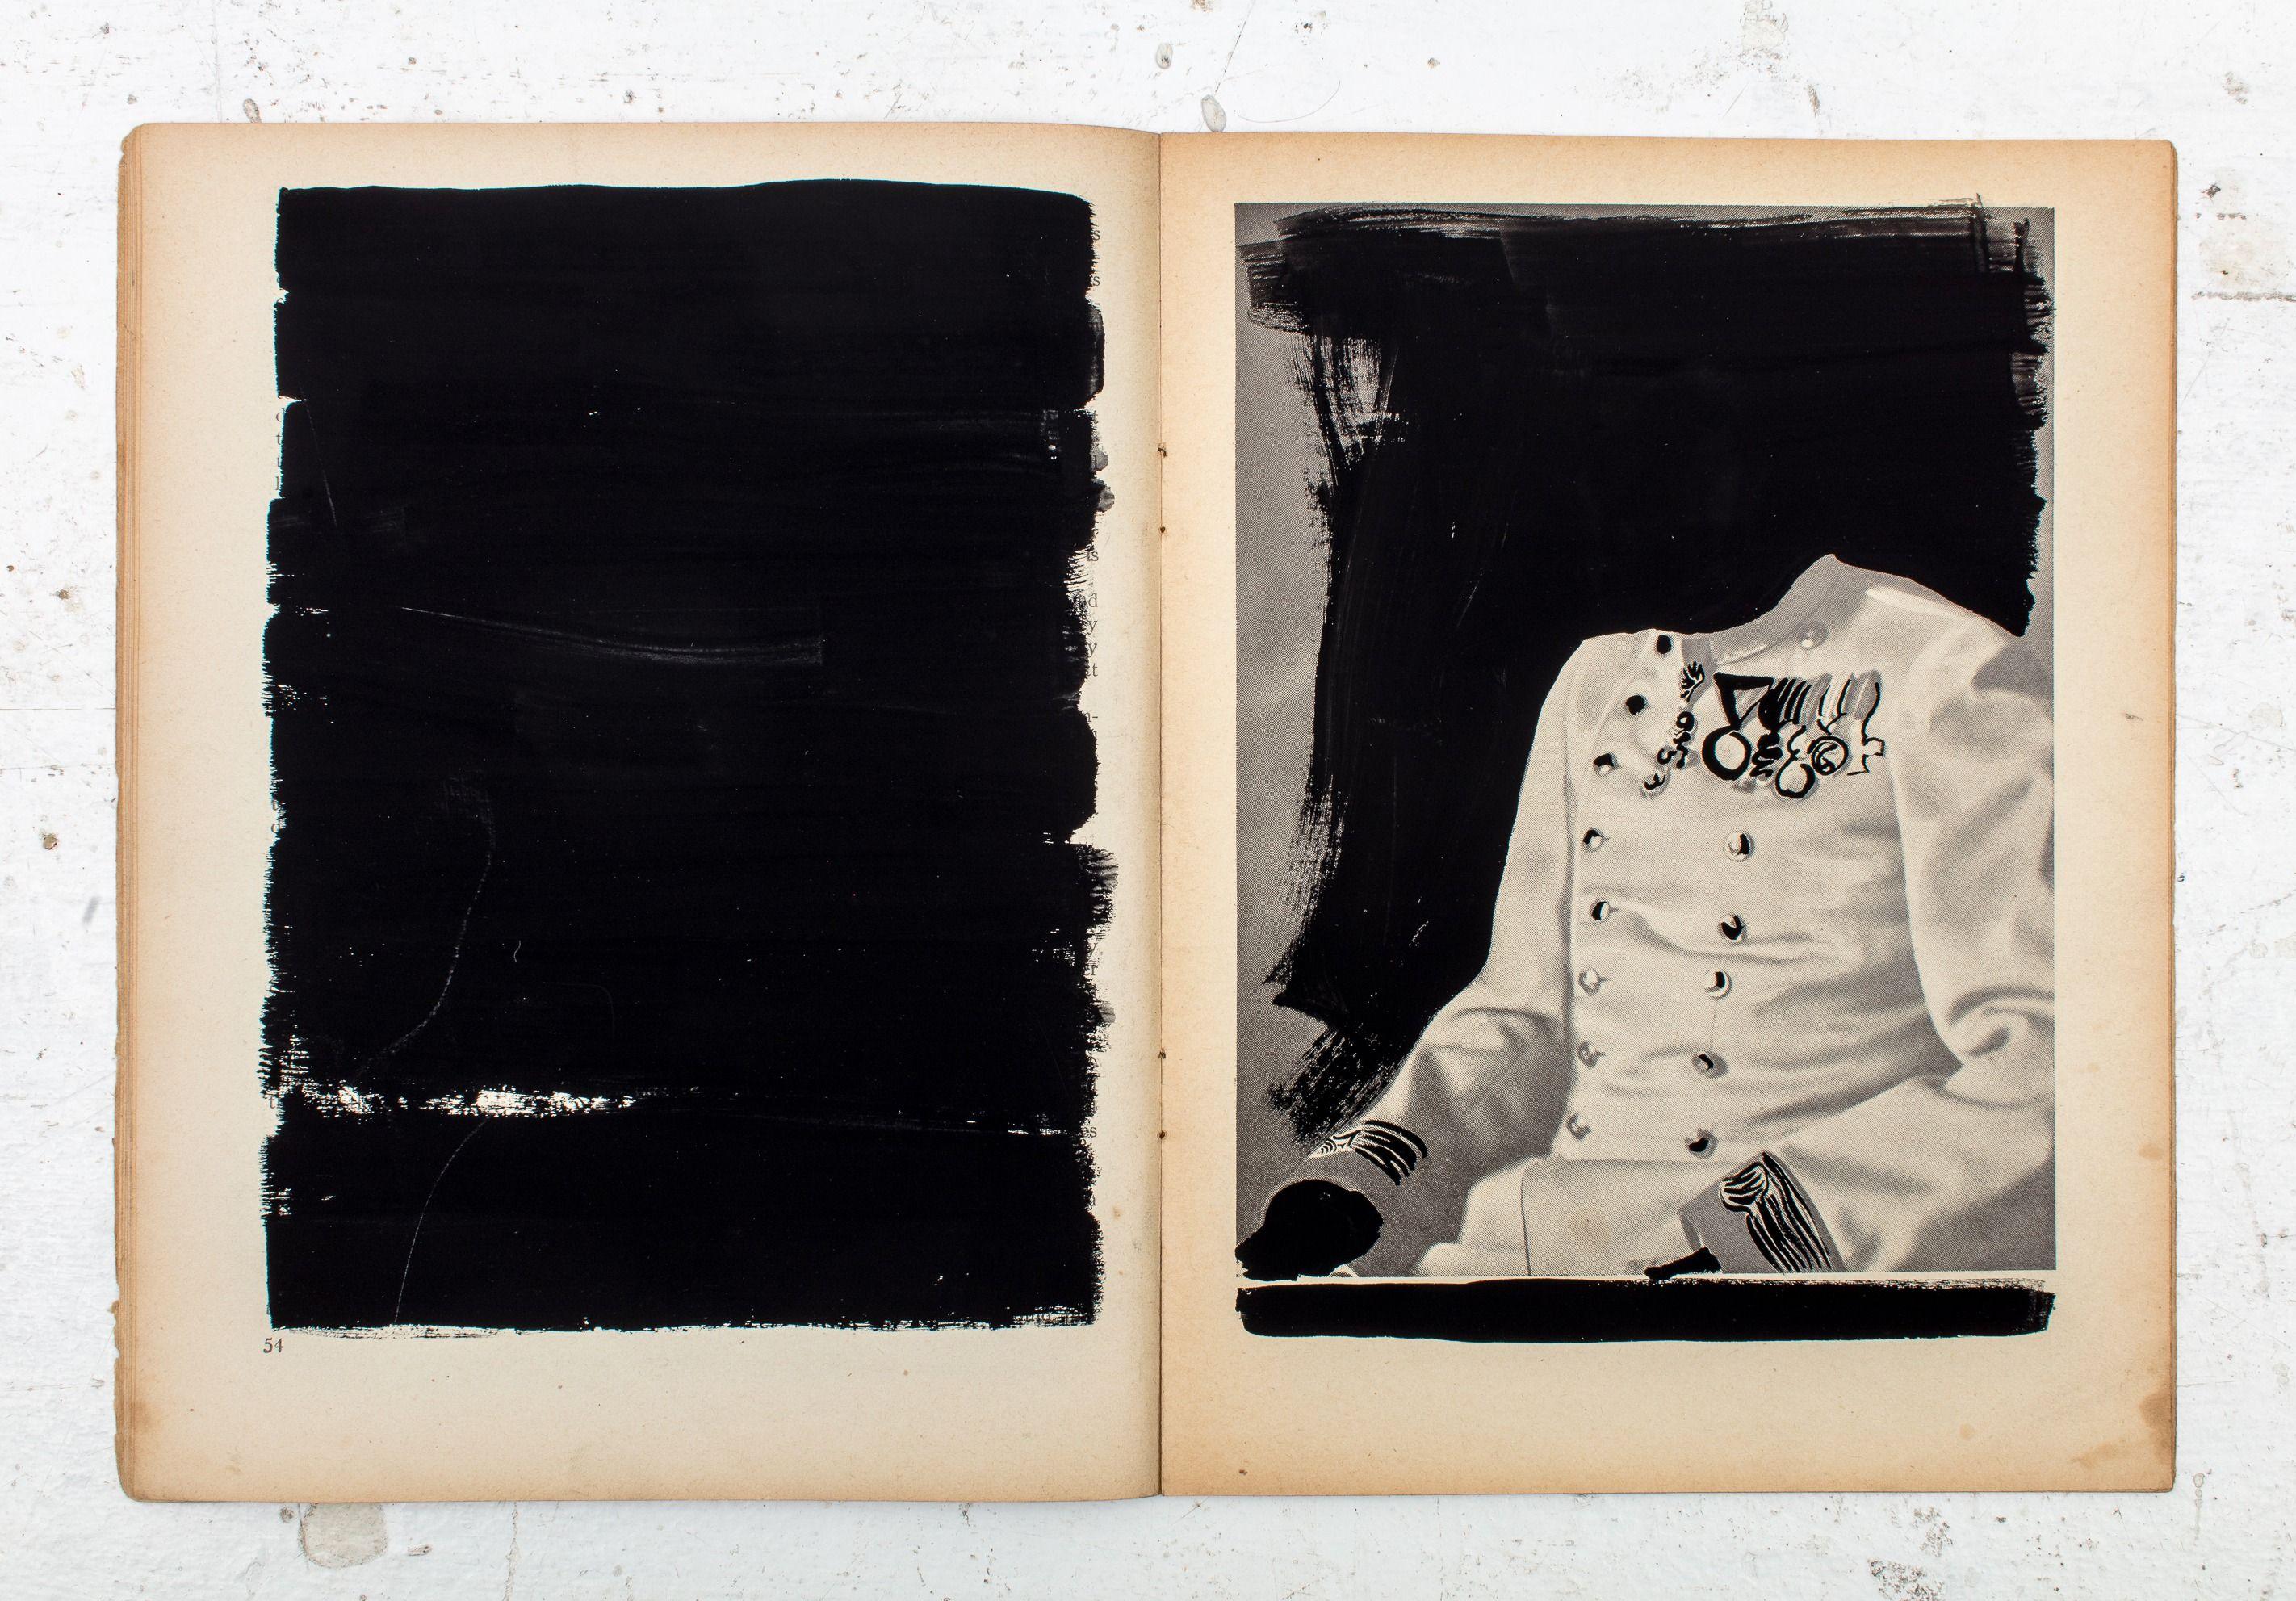 How Gideon Rubin, Jewish Artist, Reclaimed 'Mein Kampf' – The Forward